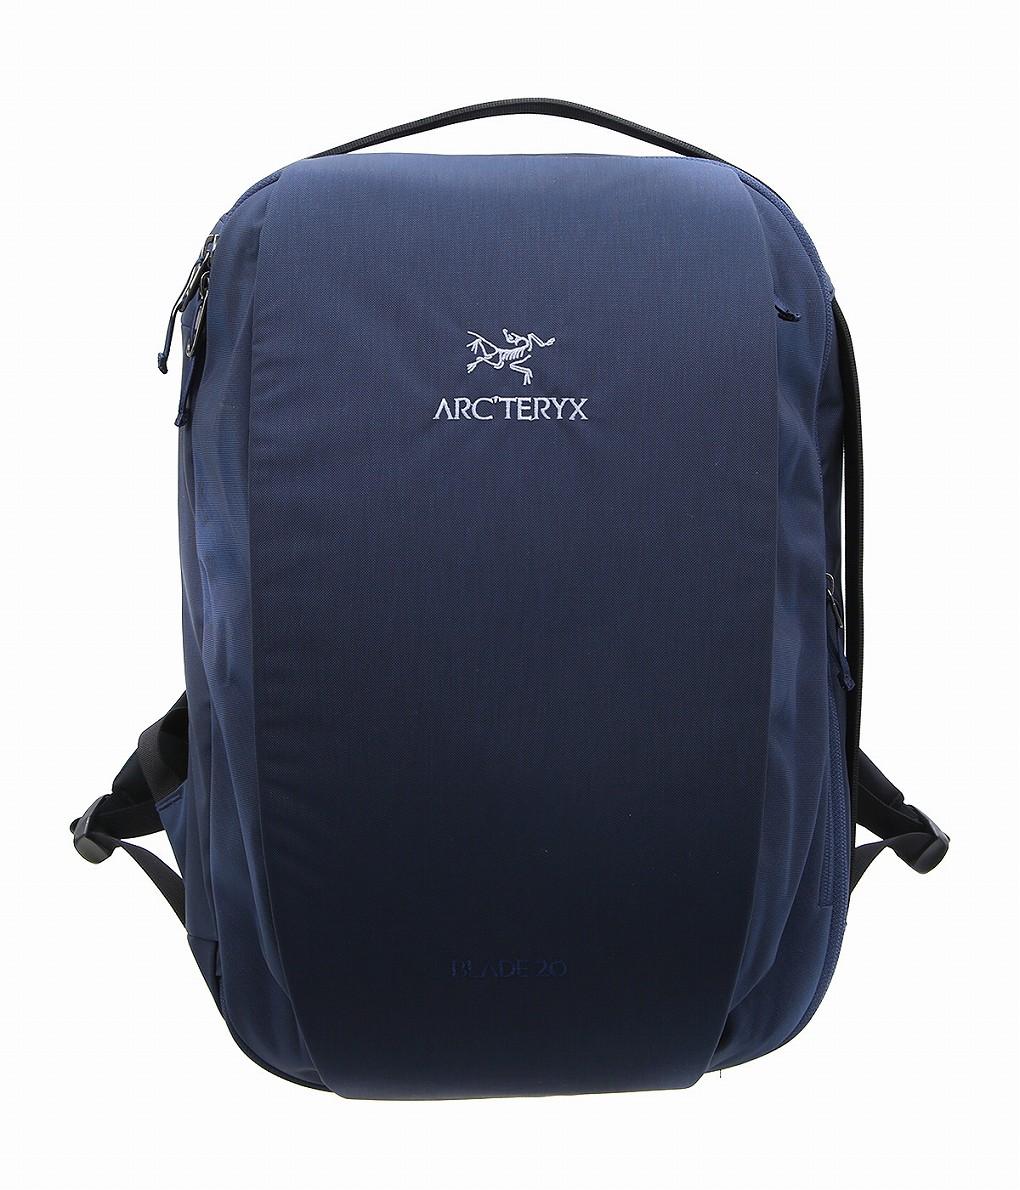 ARC'TERYX / アークテリクス : Blade 20 Backpack -Cobalt Moon- : スポーツ アークテリクス バックパック デイパック リュック バッグ カバン メンズ レディース : L07321500 【STD】